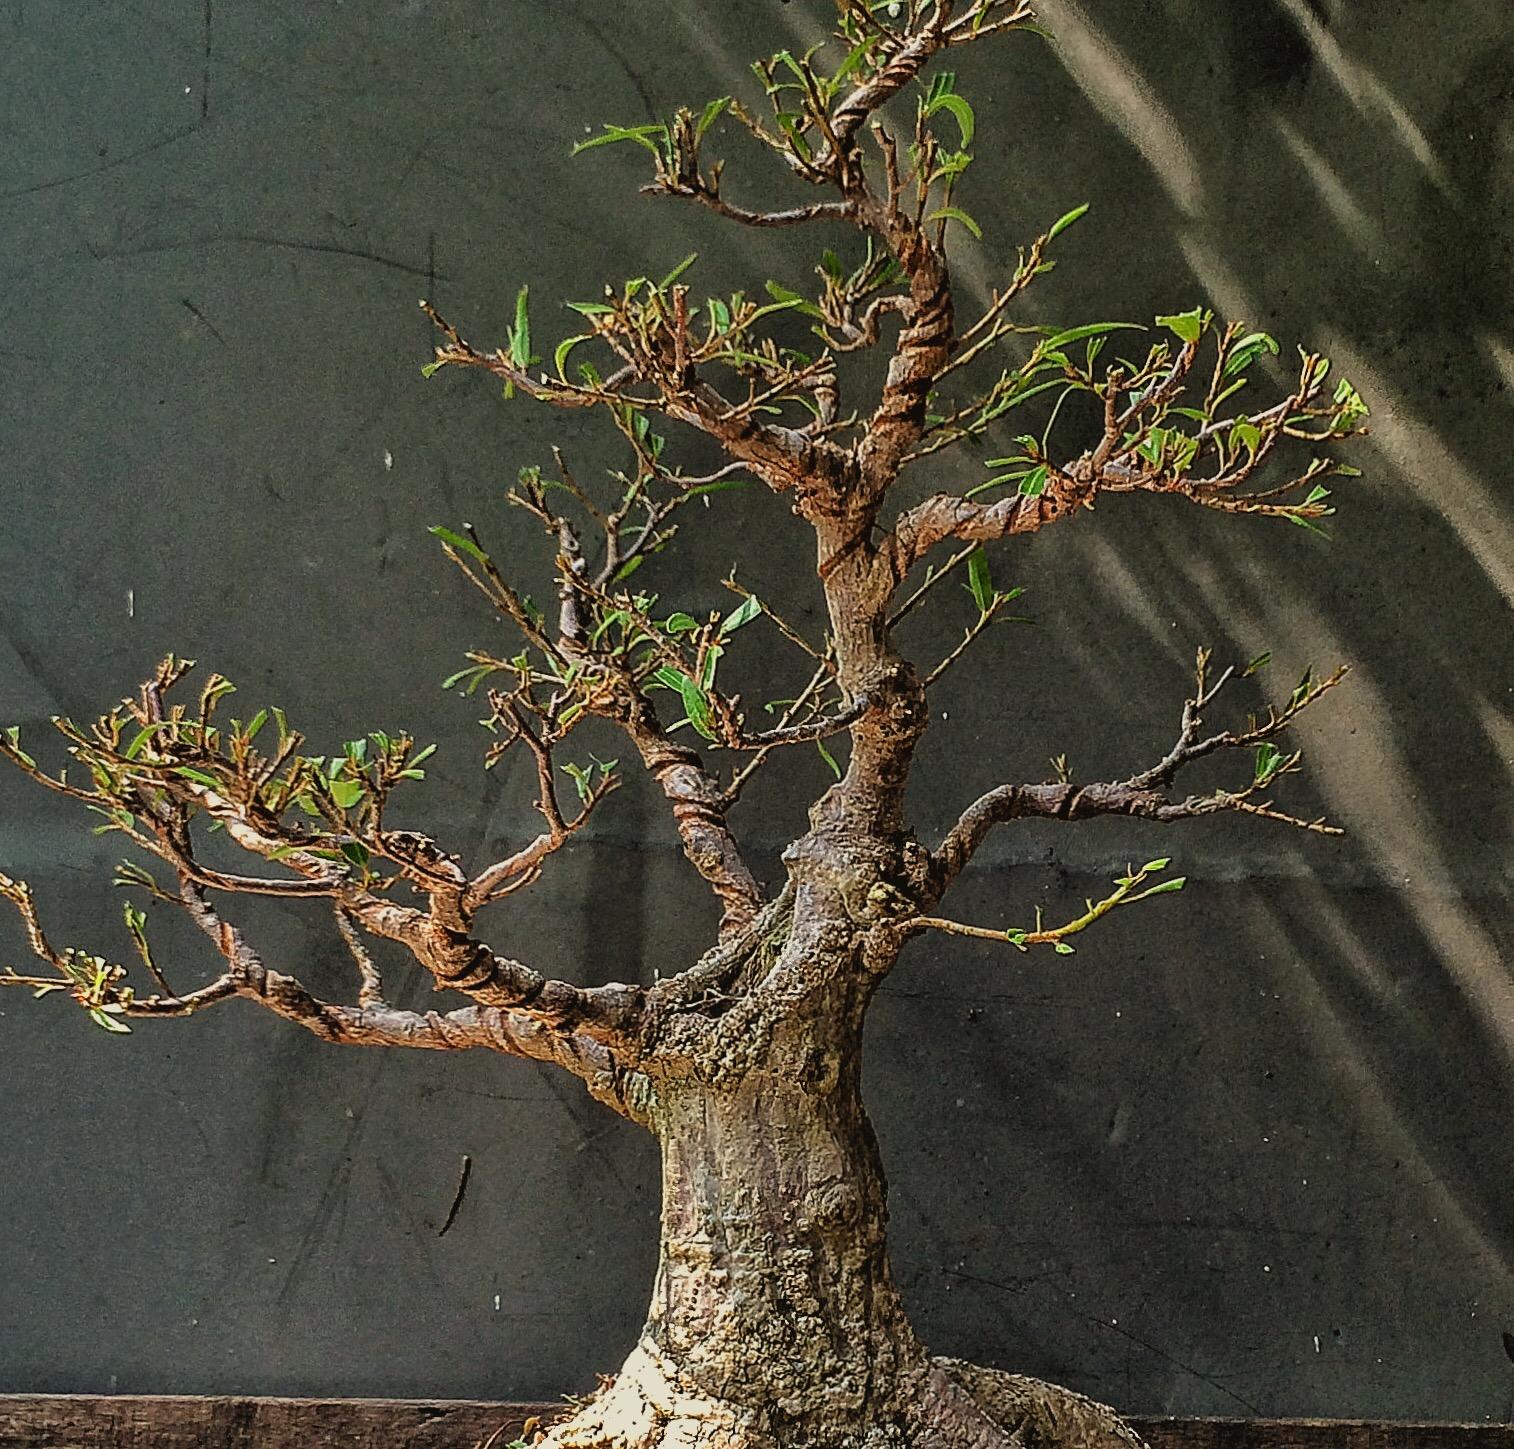 bonsai wiring how long library of wiring diagram u2022 rh jessascott co bonsai wiring pseudocydonia sinensis bonsai wiring techniques with pics